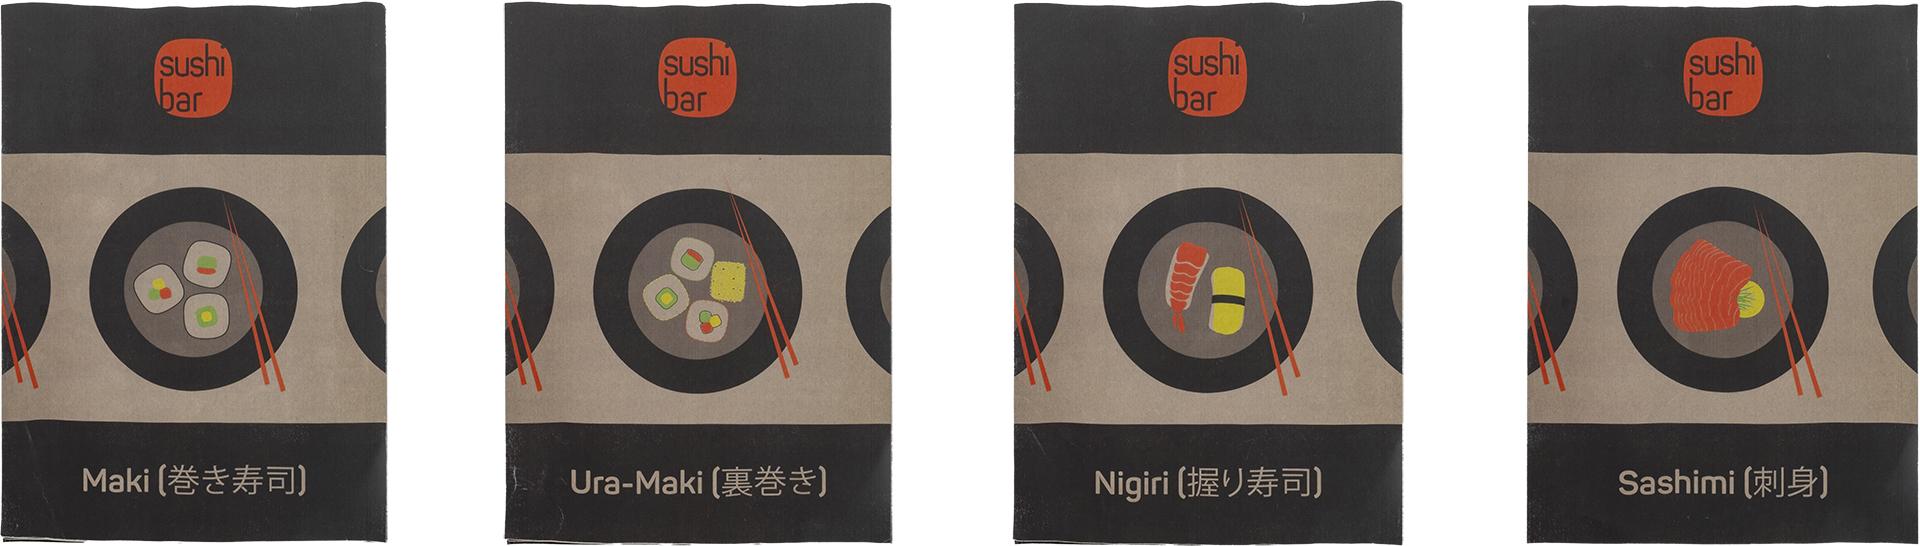 SushiBar Advertising Poster, Werbung Plakat, Sebastian Knöbber